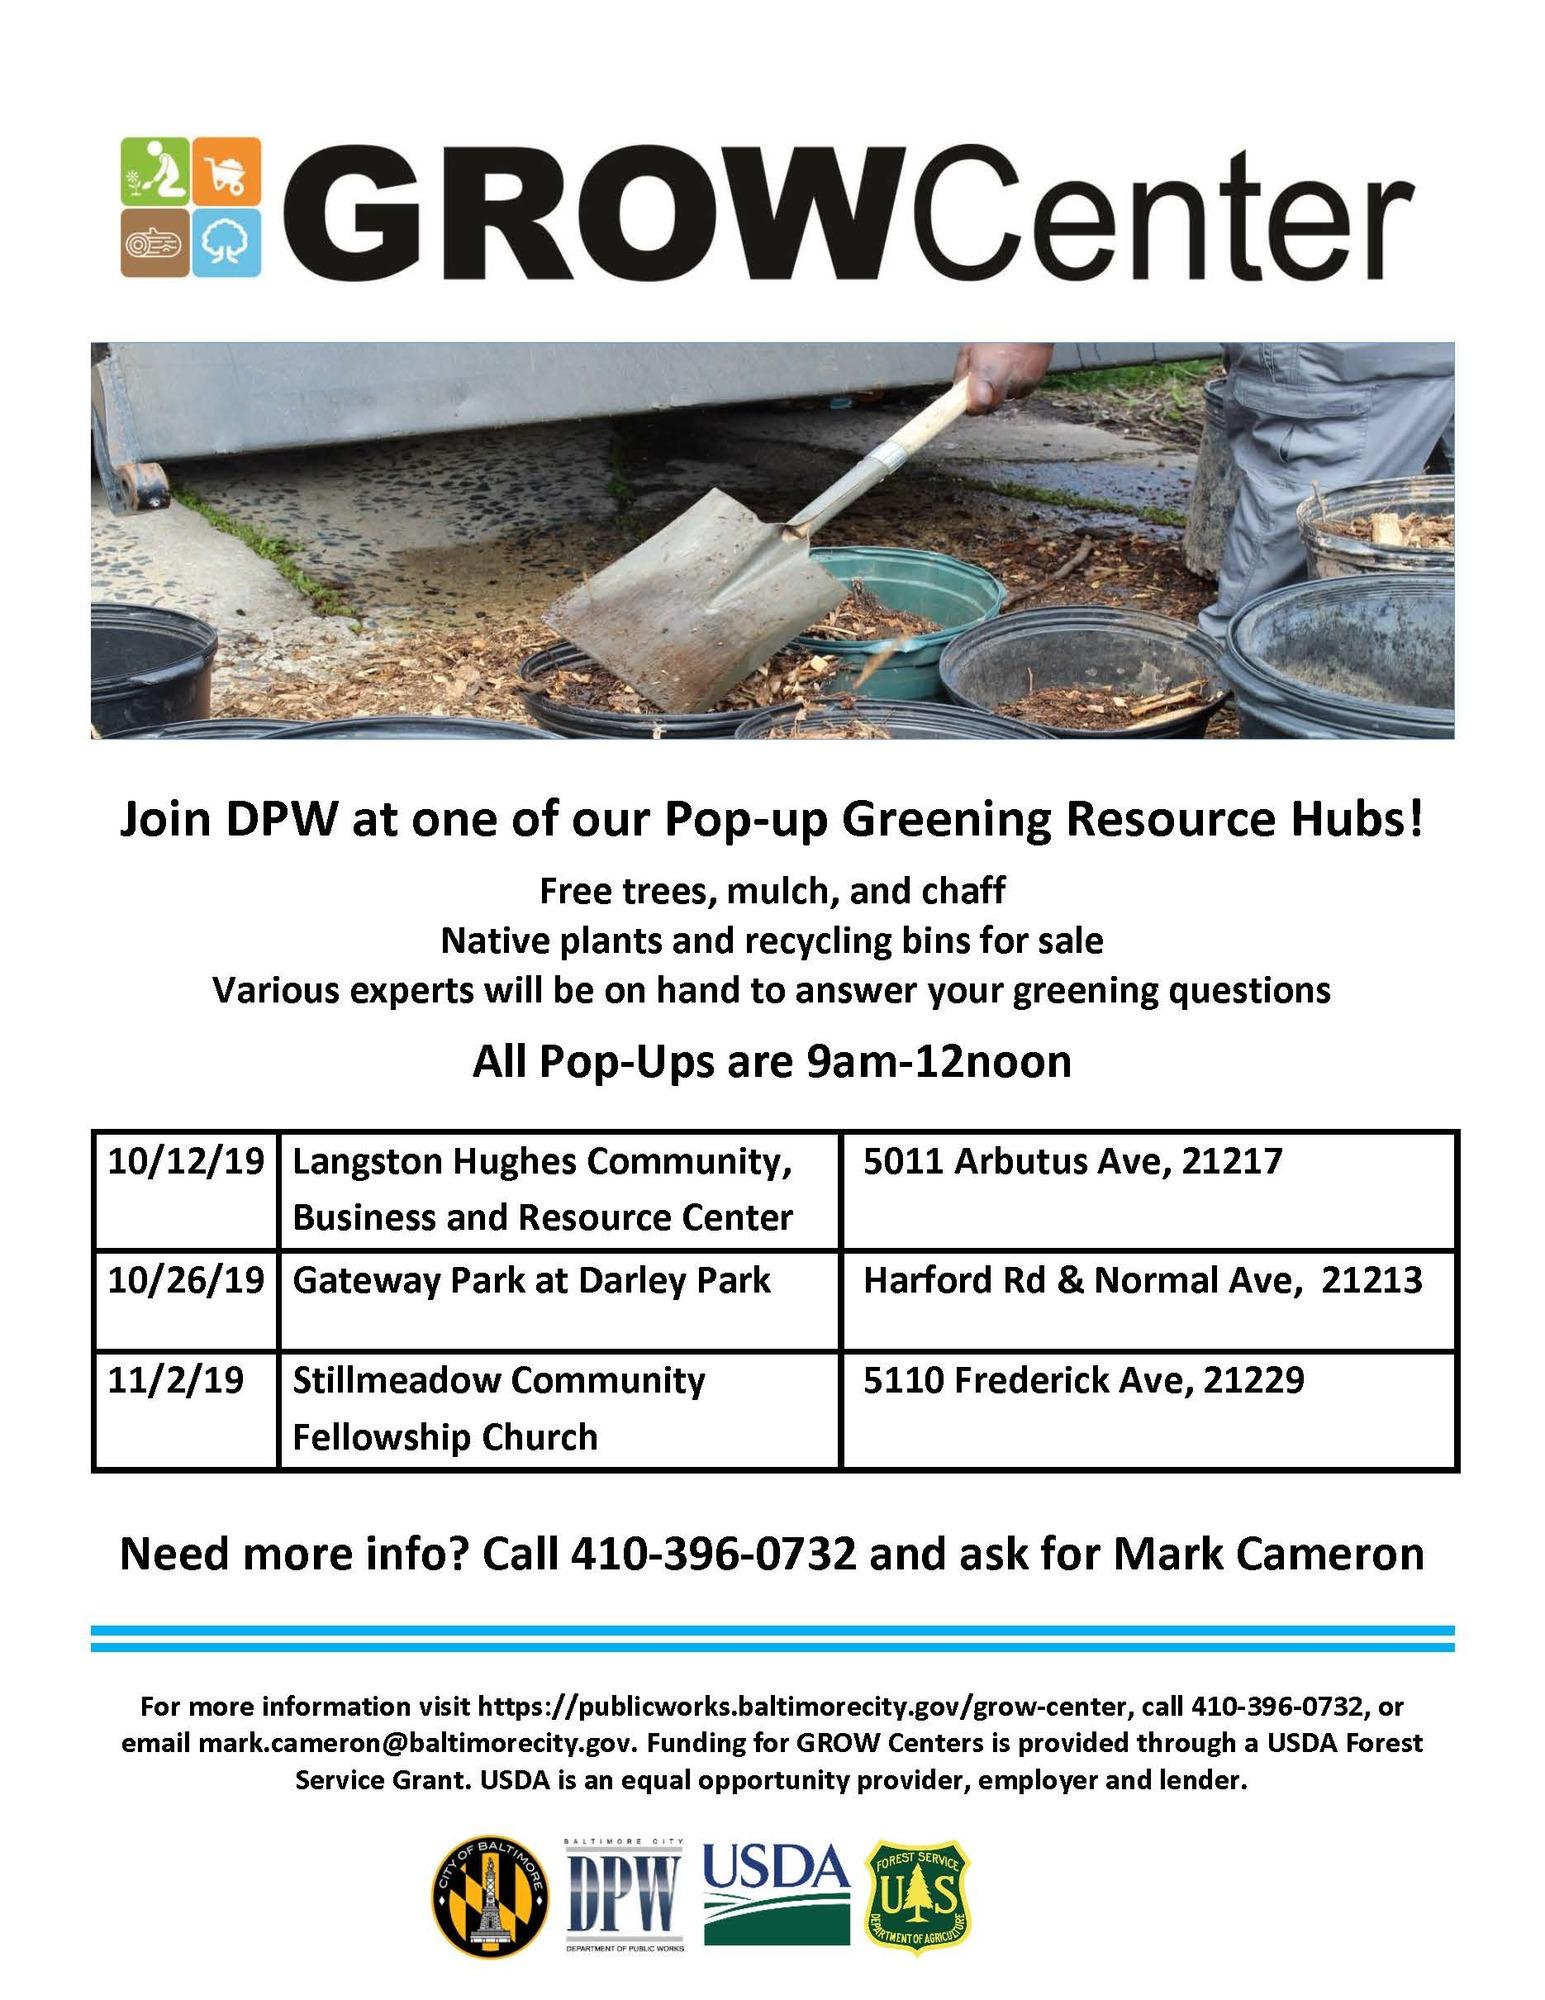 GROW Center